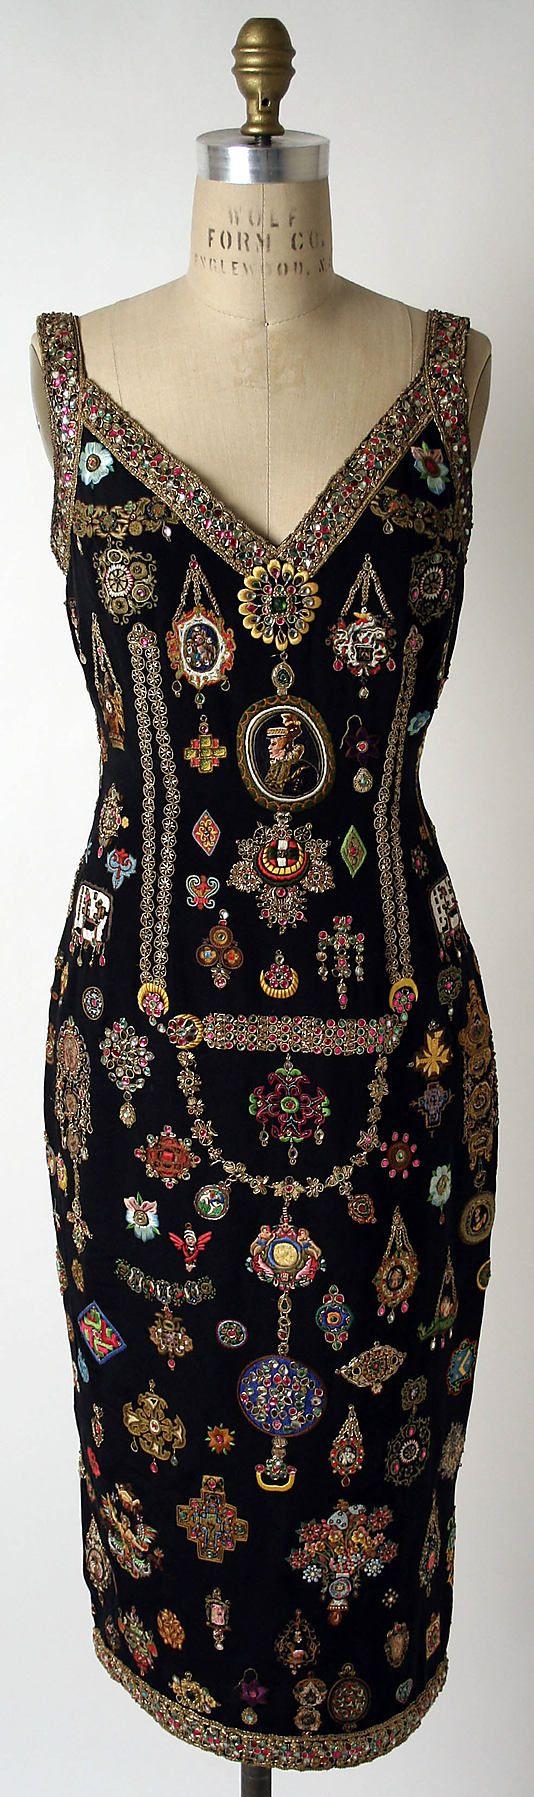 Dress Todd Oldham (American, born 1961) Date: spring/summer 1992 Culture: American Medium: silk Dimensions: Length at CB: 35 3/8 in. (89.9 c...